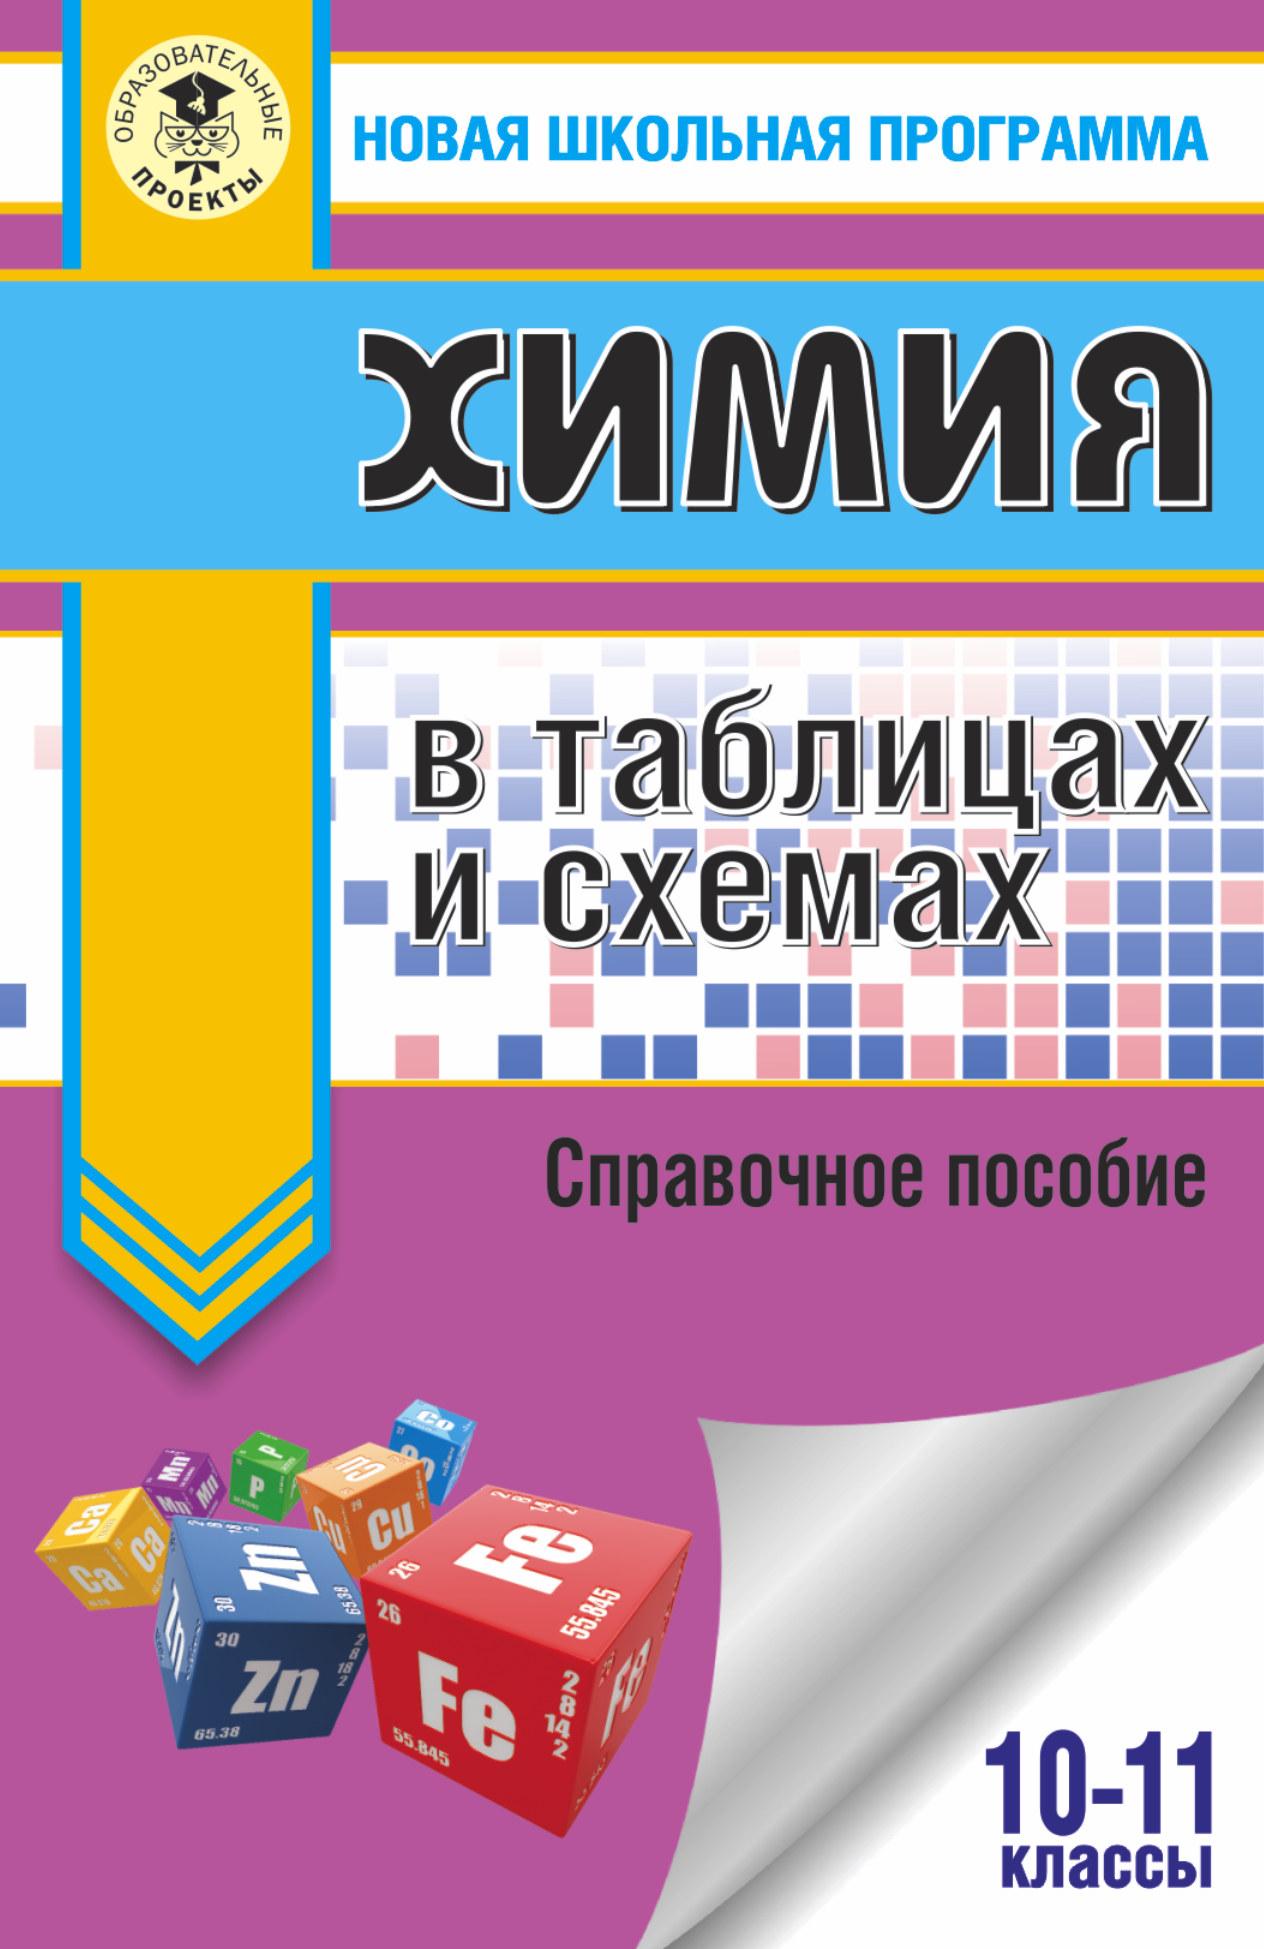 Савинкина Е.В., Логинова Г.П. Химия в таблицах и схемах. 10-11 классы